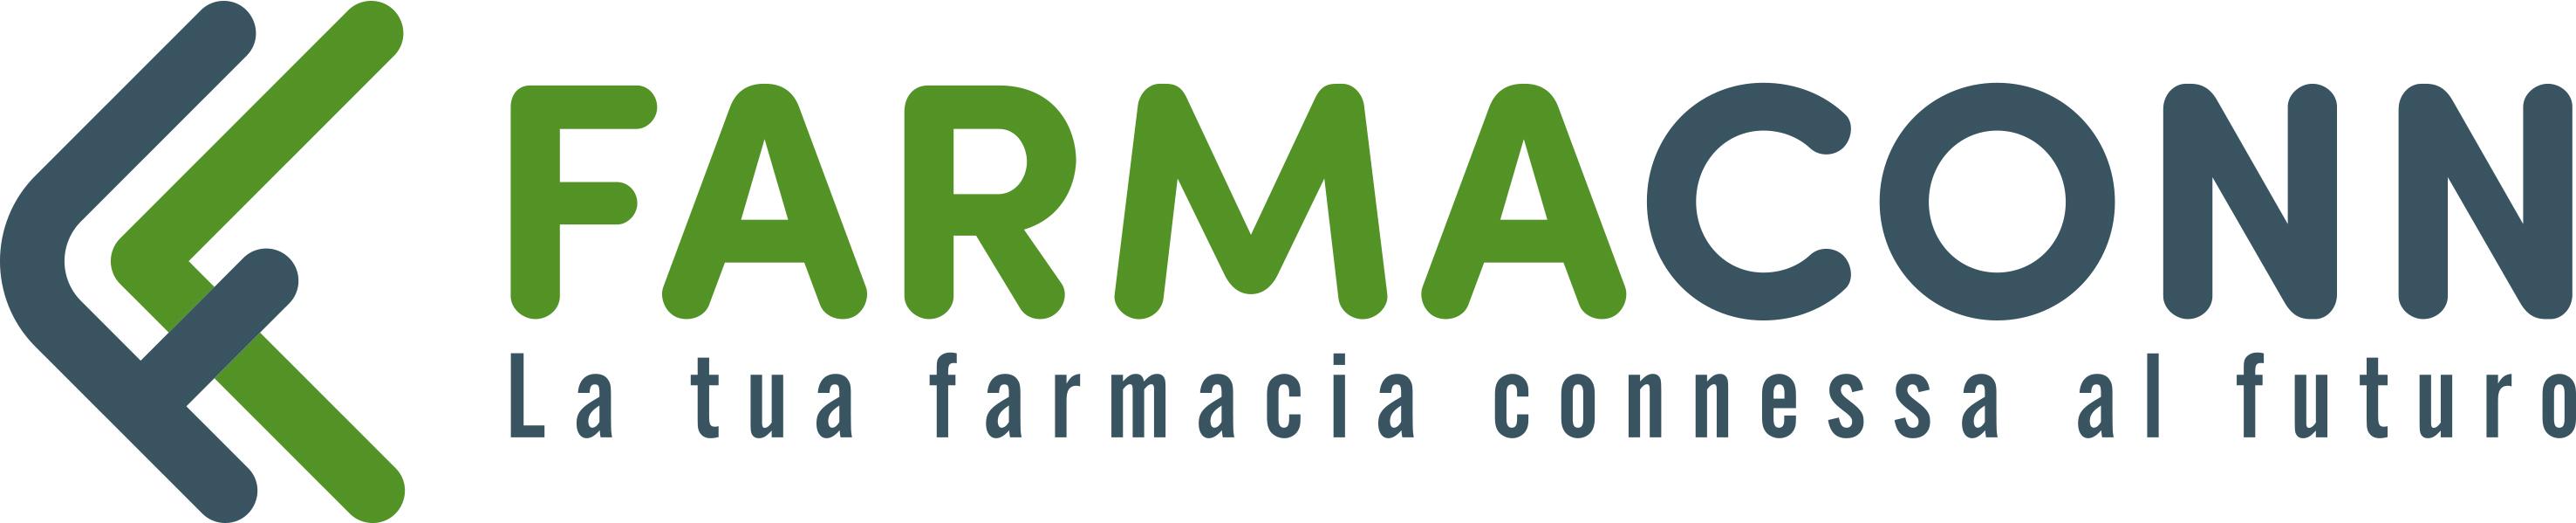 logo FarmaConn